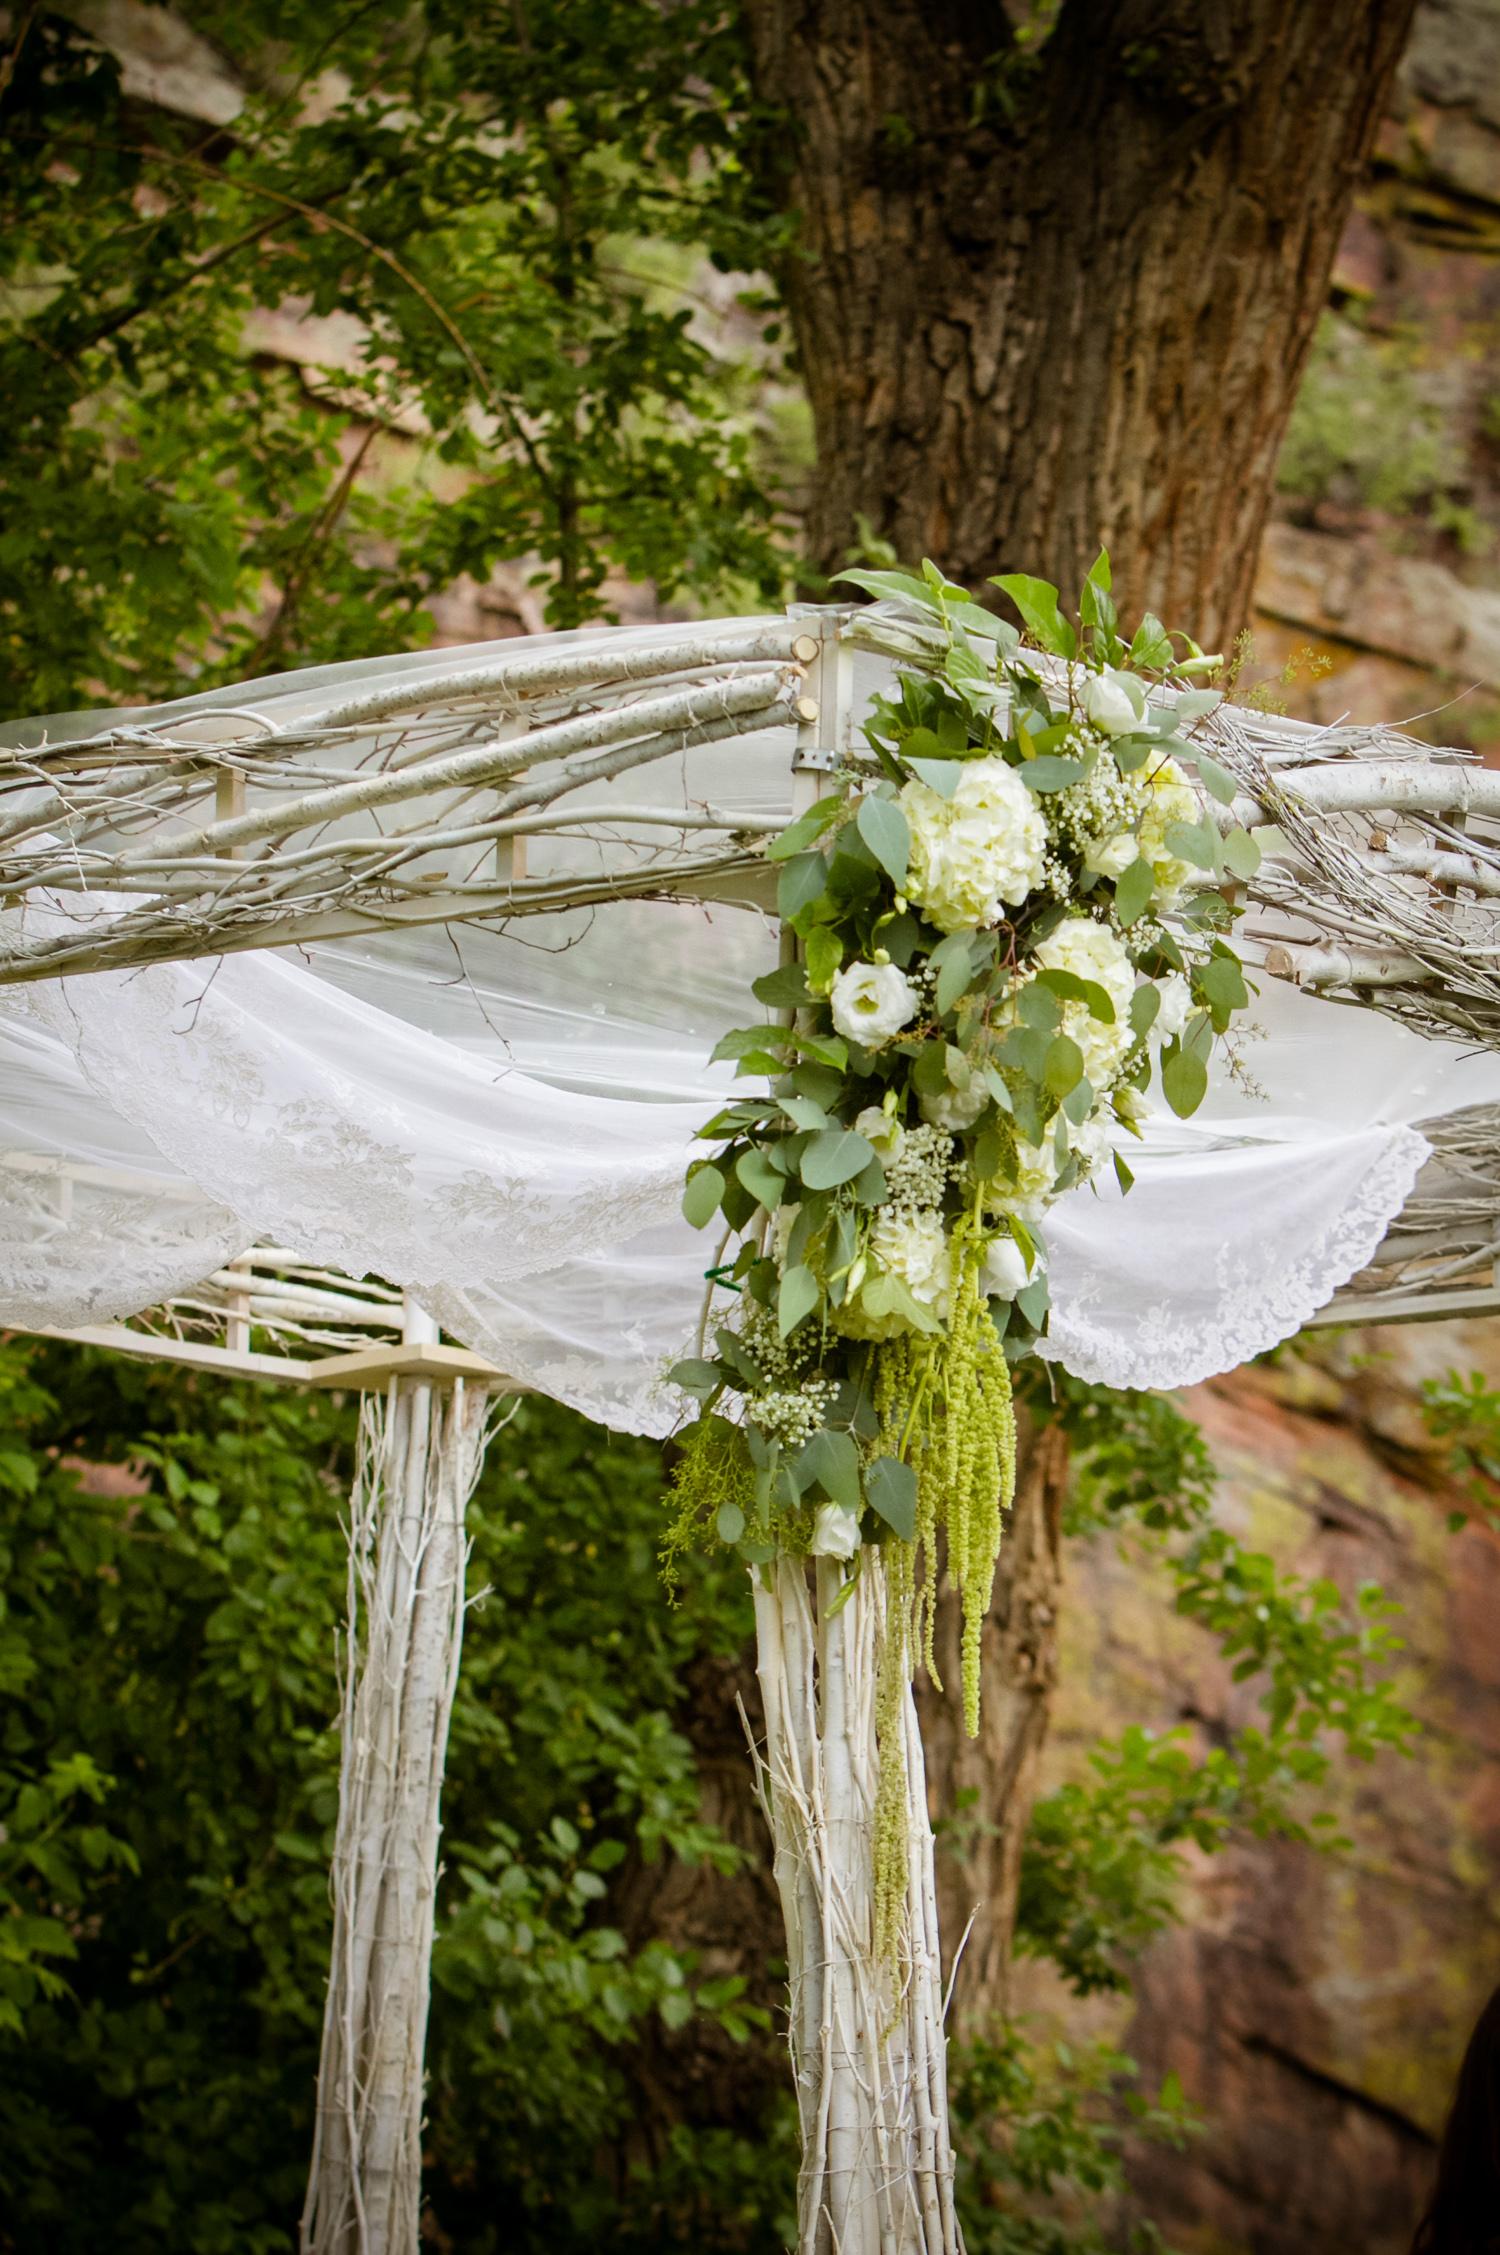 Planet_Bluegrass_Lyons_Wedding_043.JPG